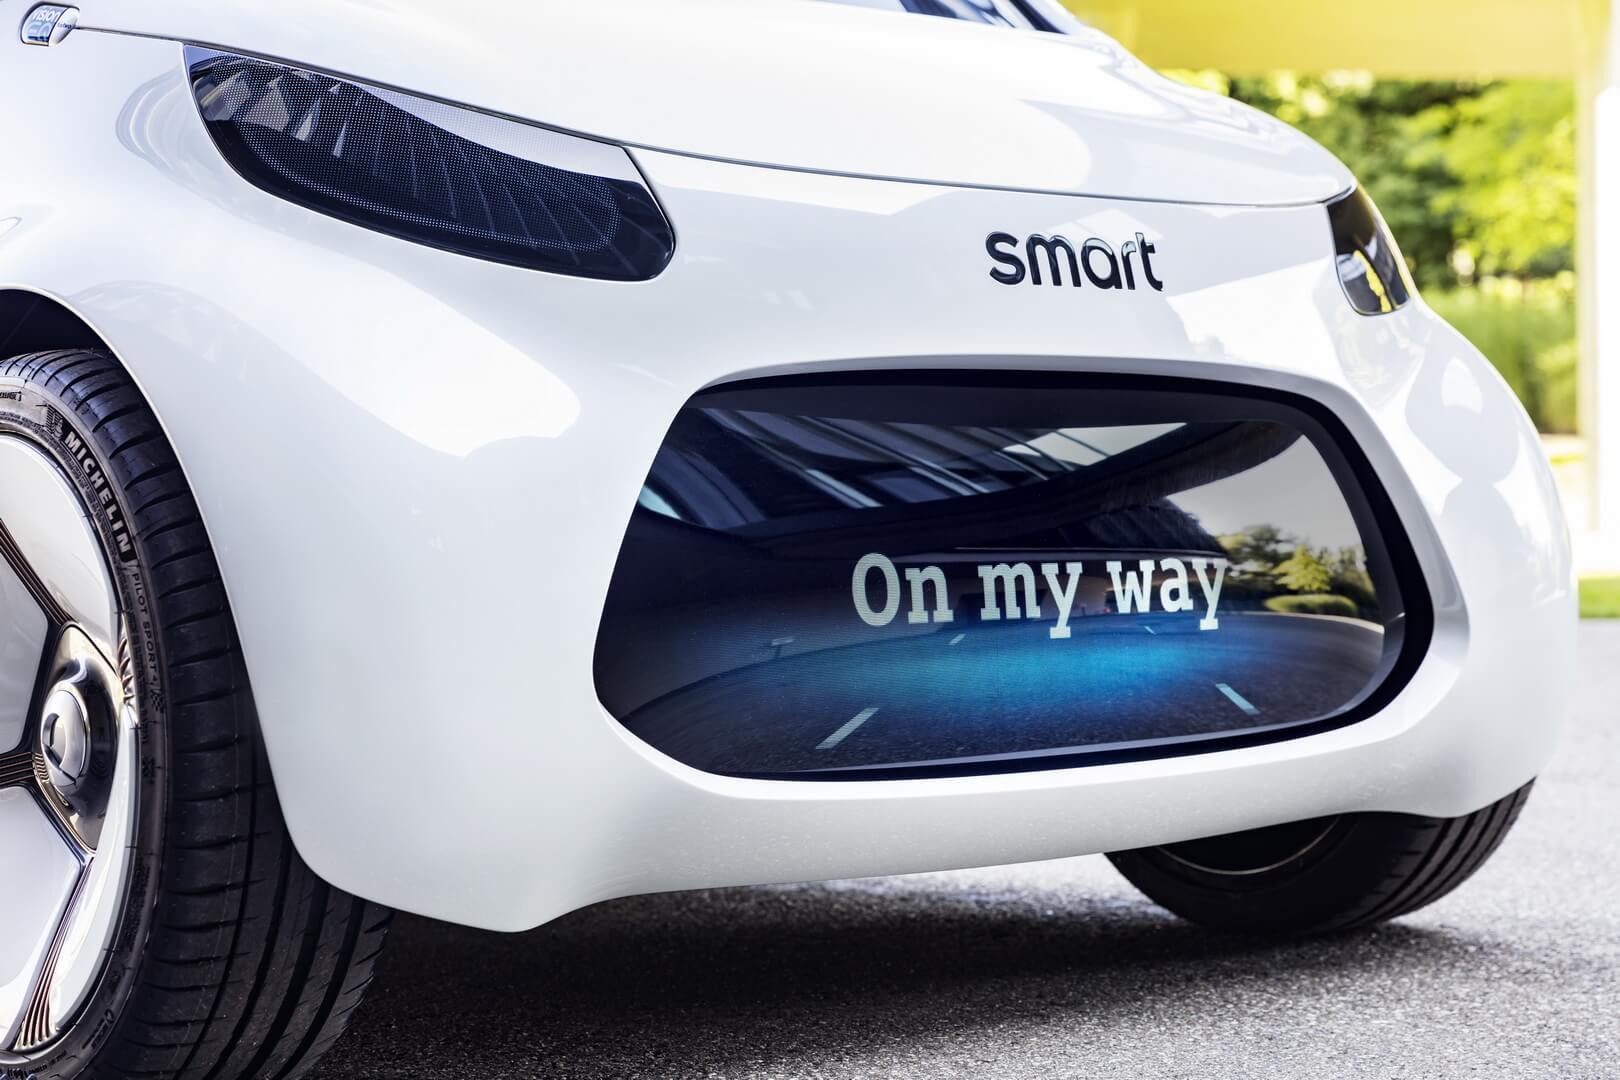 Светодиодные дисплеи вместо фар в Smart Vision EQ fortwo